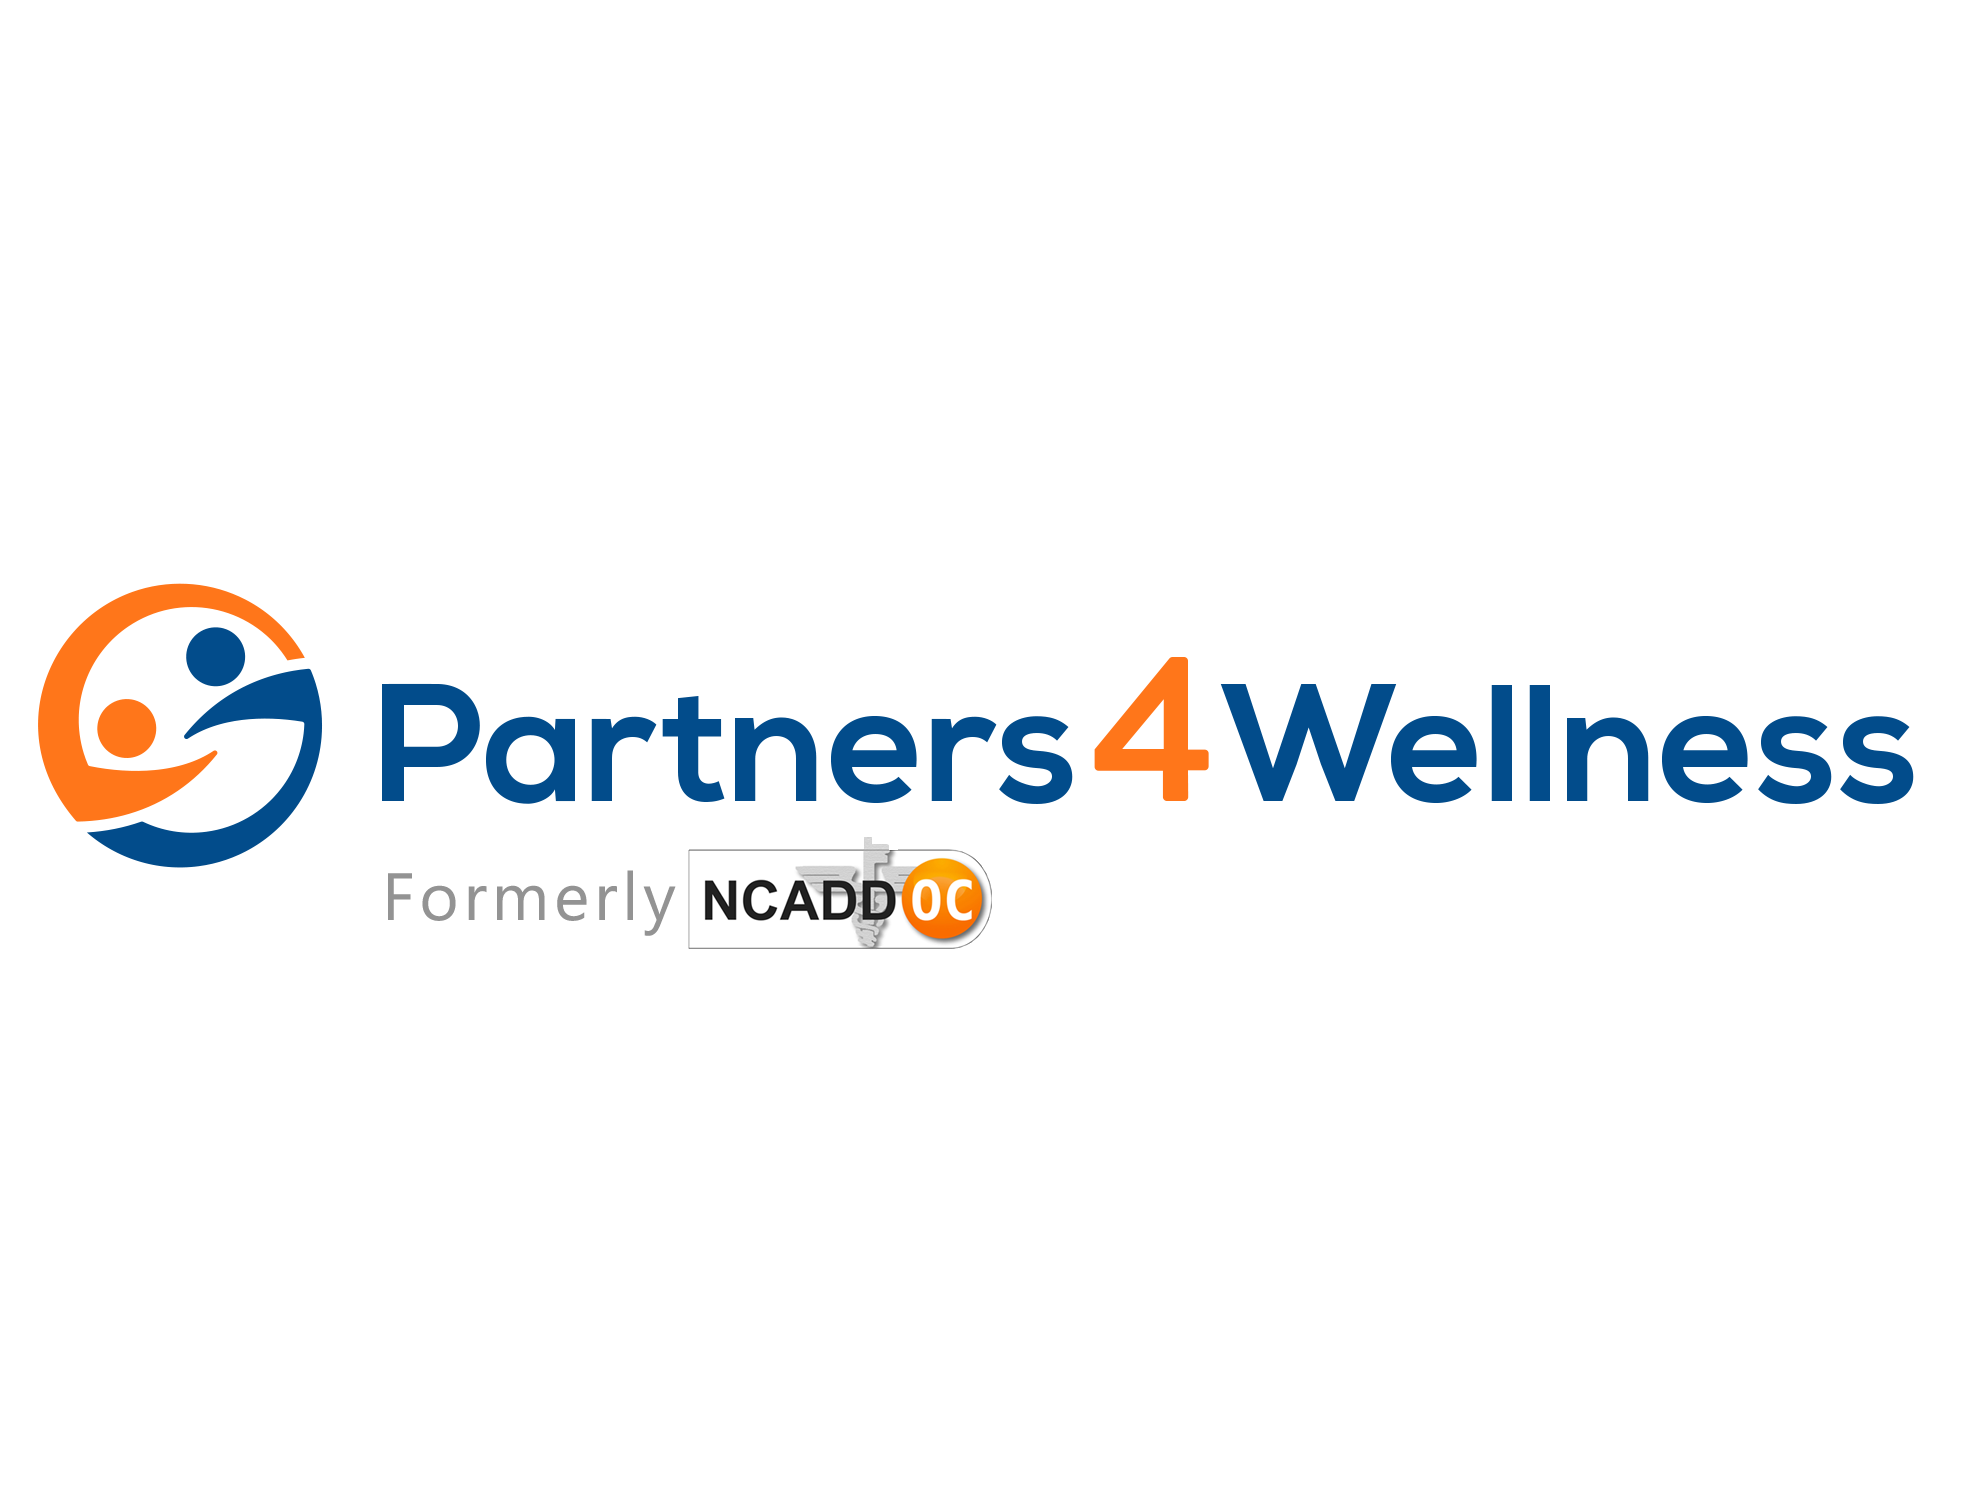 Partners4Wellness formerly NCADD copy